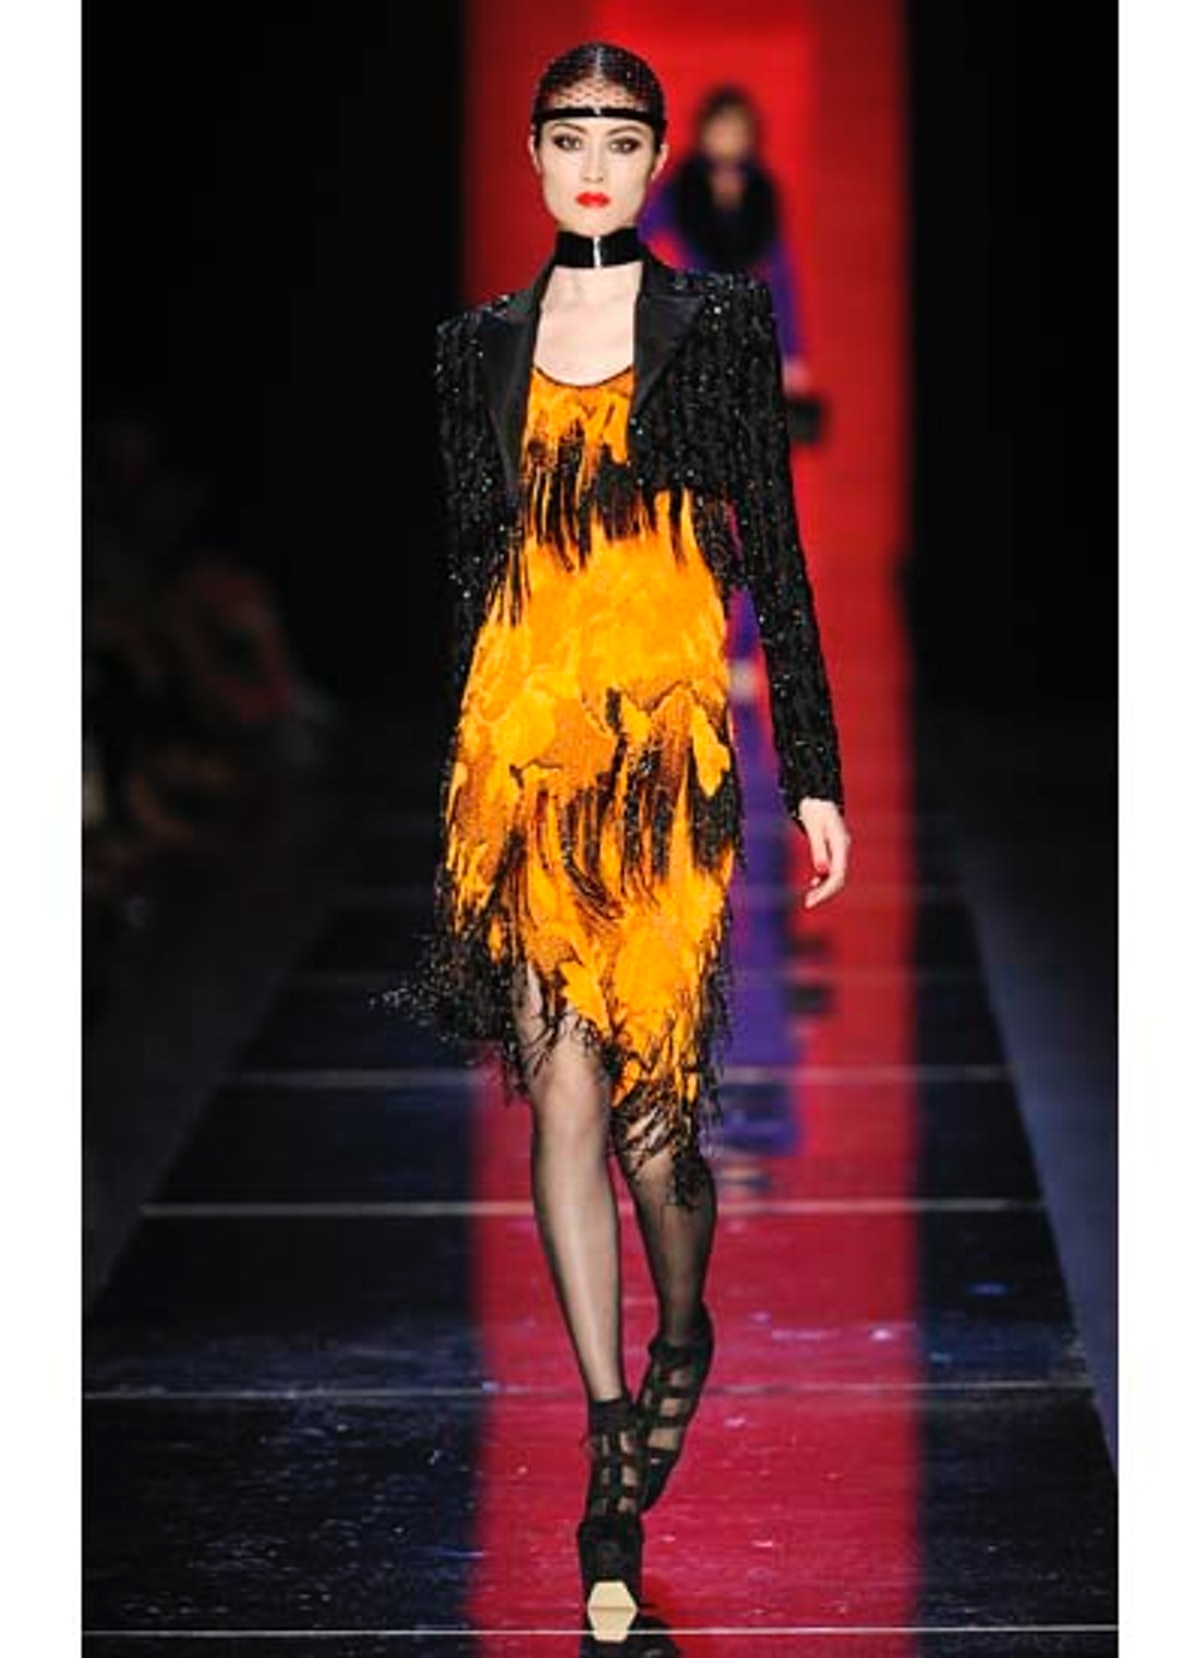 fass-jean-paul-gaultier-couture-2012-runway-26-v.jpg